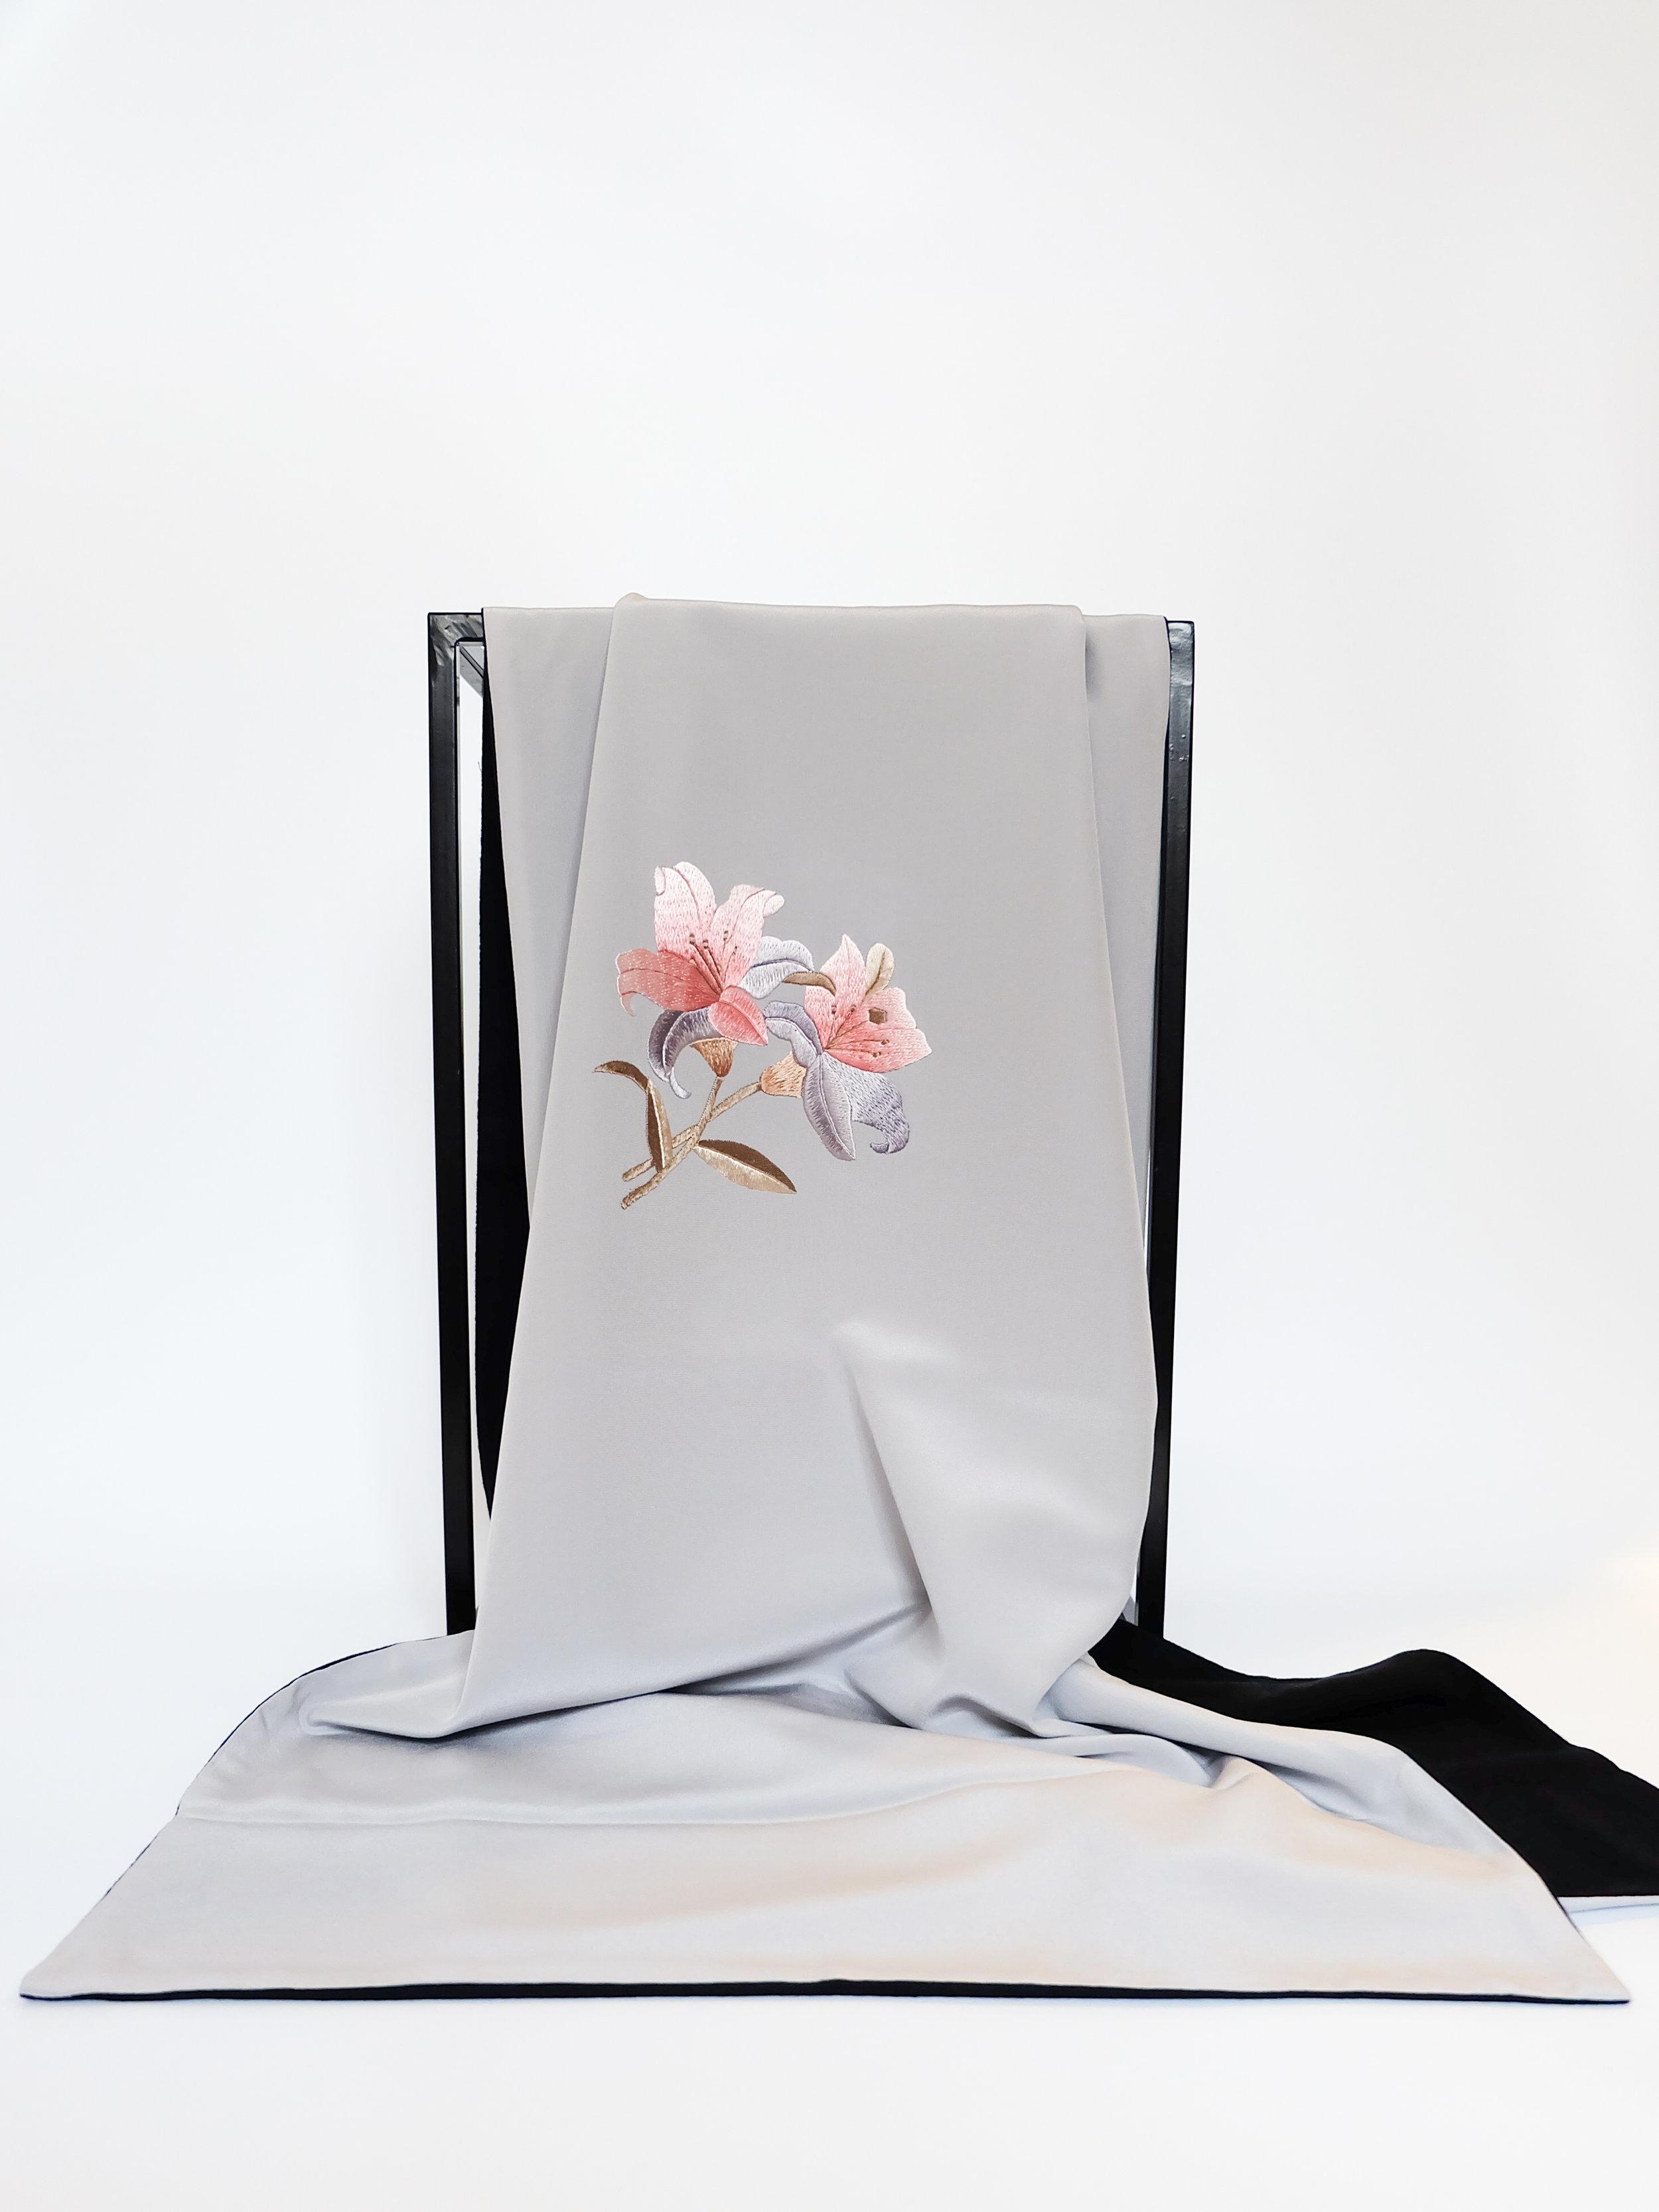 Wild Lily's Dance (Silver) - 110x110cm